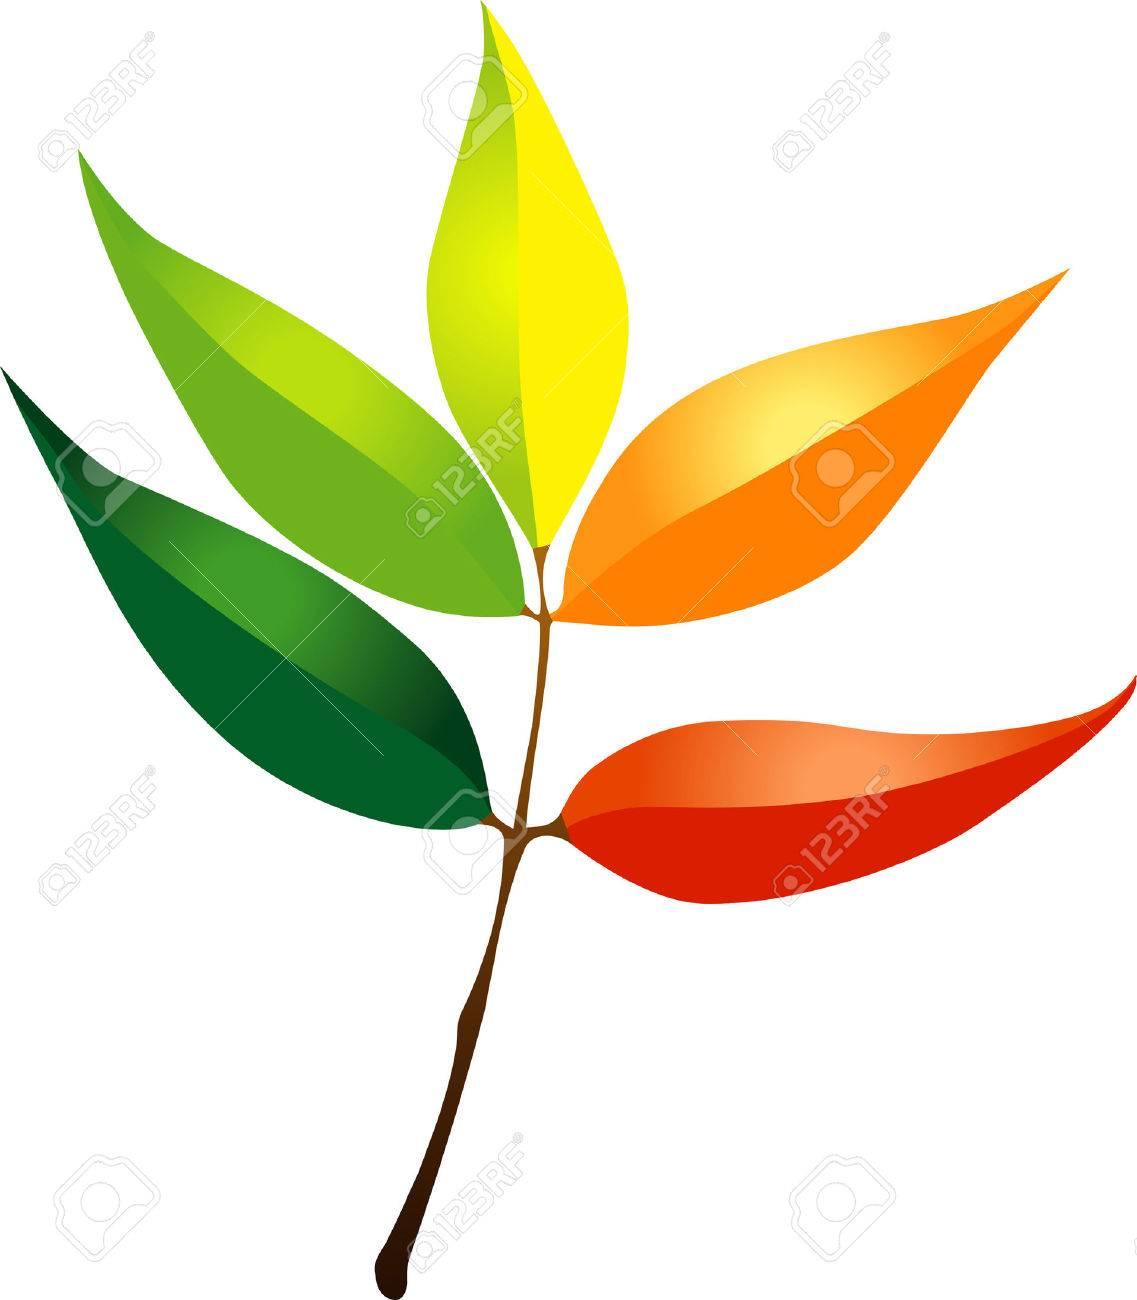 Autumn leaf - 6737442